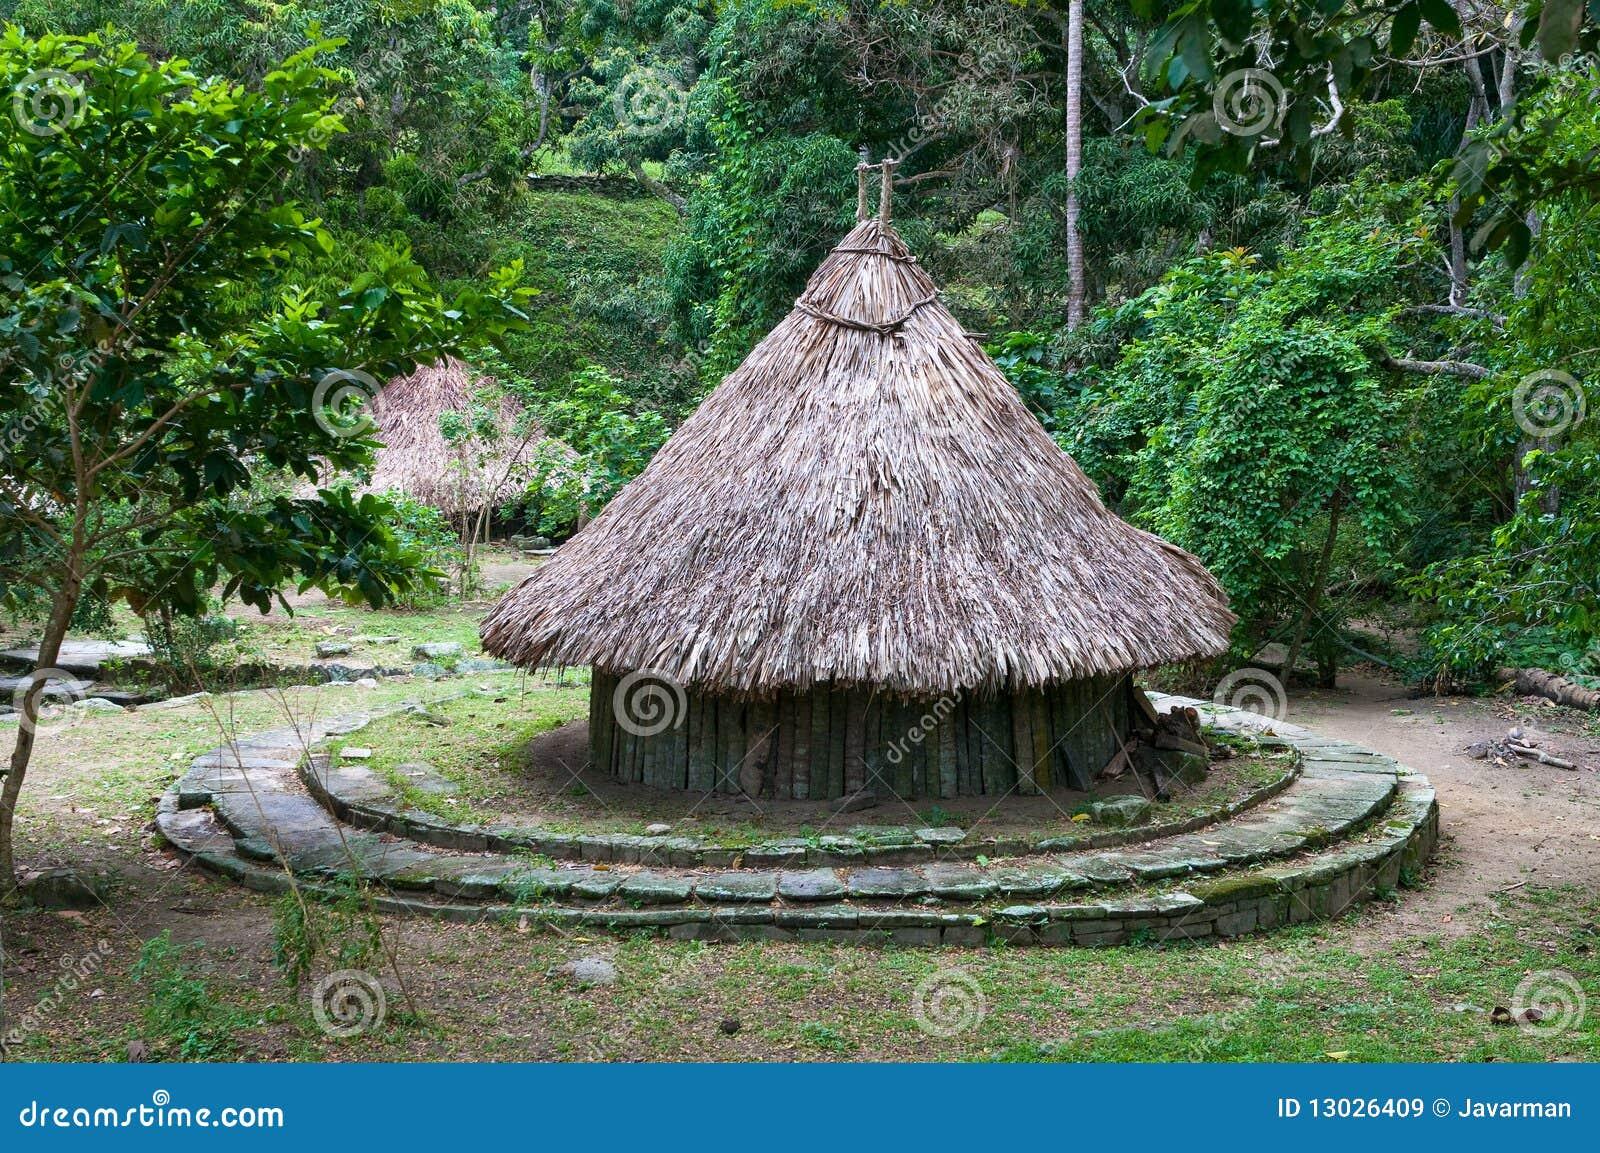 Pueblito archäologische Fundstätte, Tayrona Nationalpark